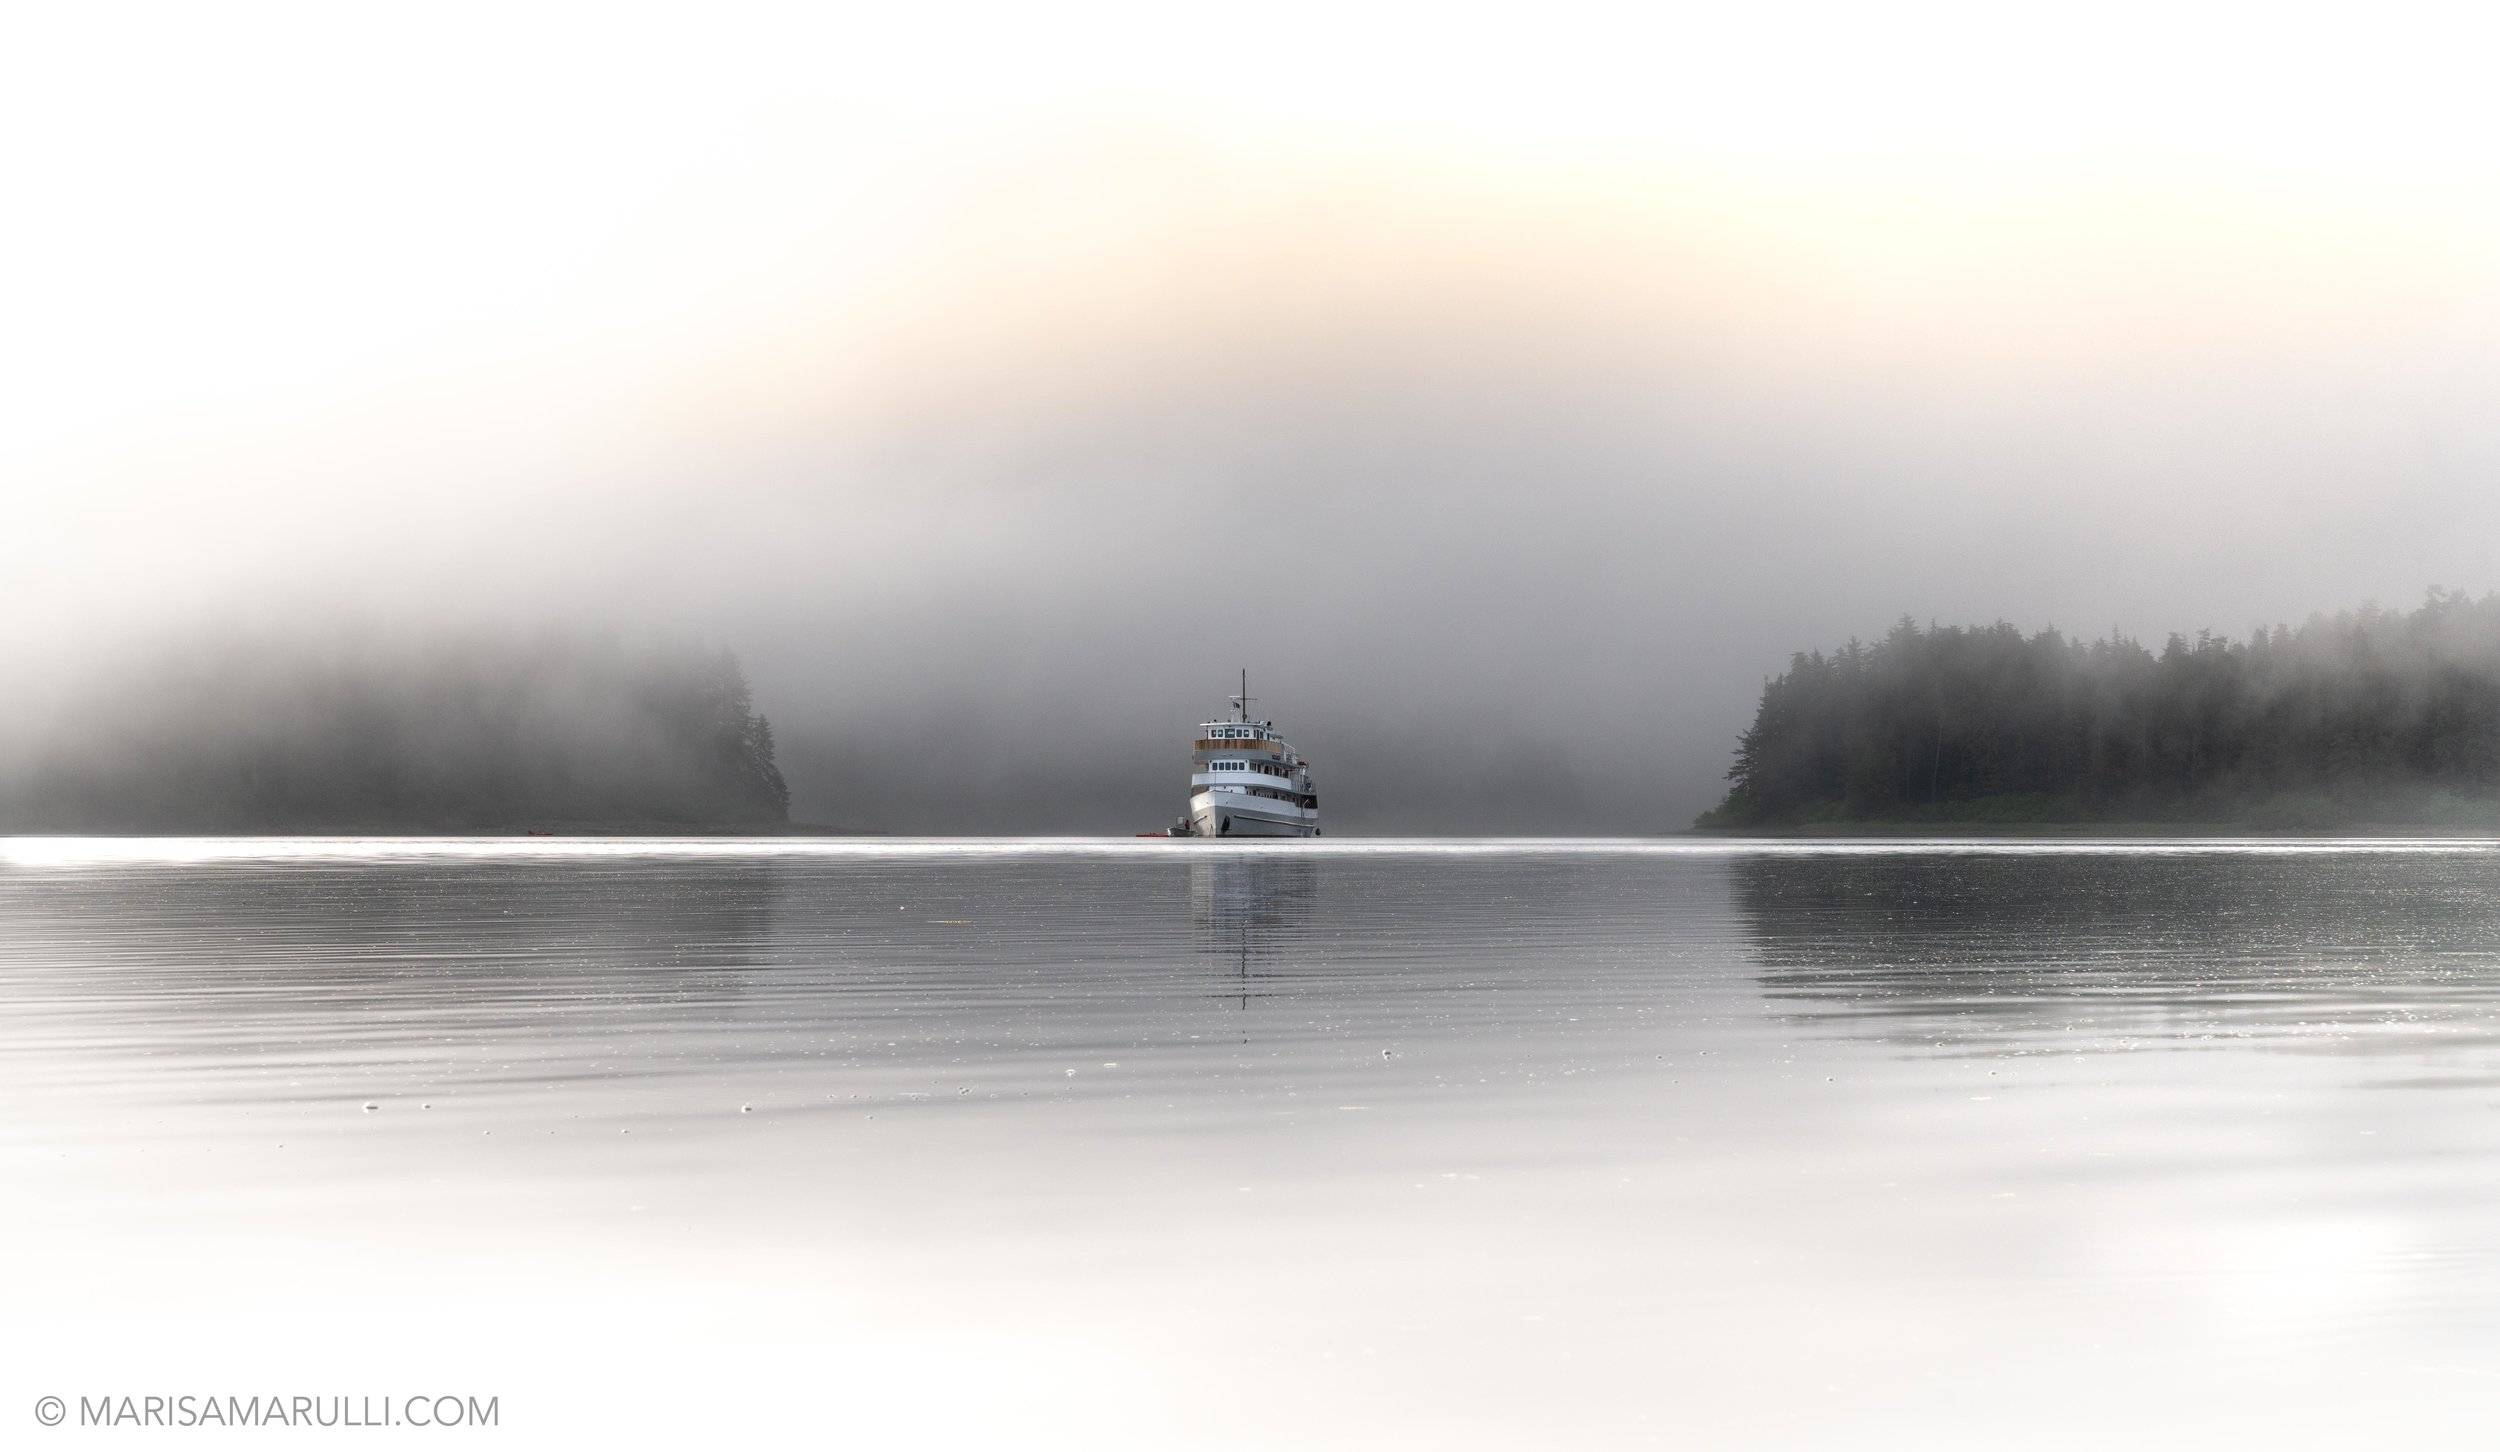 183-2_Photo By Marisa Marulli_Tongass National Forest_Alaska.jpg